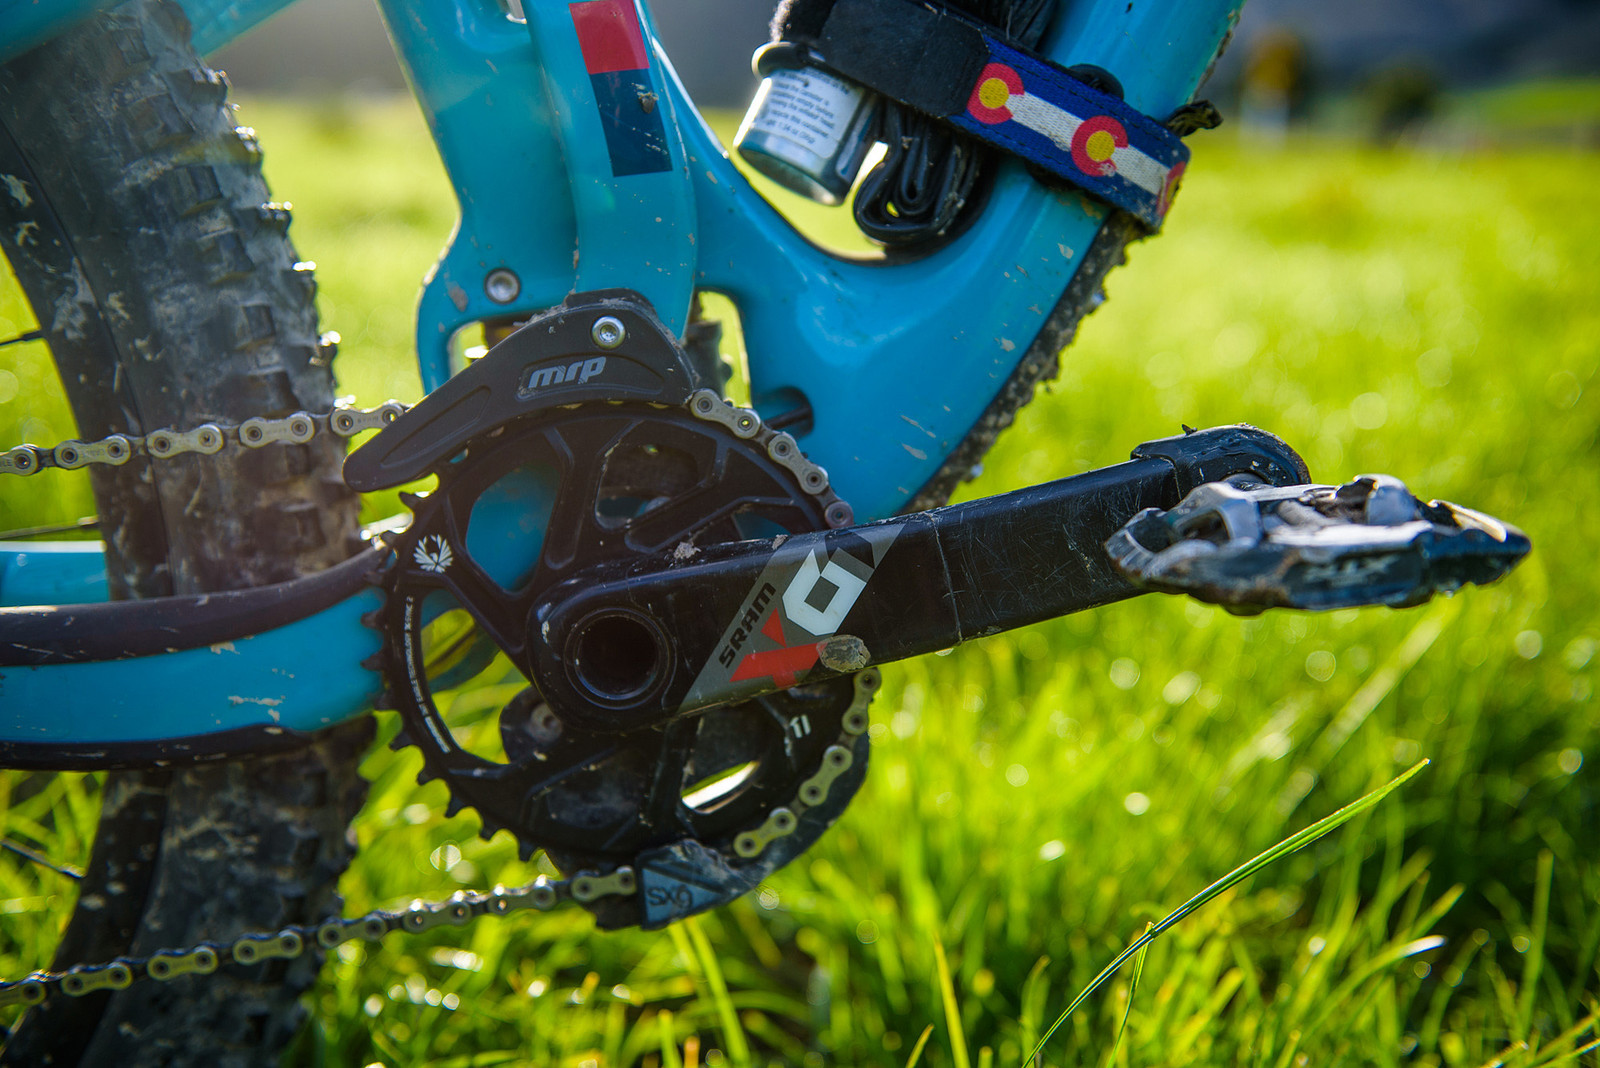 MRP SXG Chainguide for Extra Security - Nate Hills' Yeti SB5 with 2019 RockShox Lyrik - Mountain Biking Pictures - Vital MTB